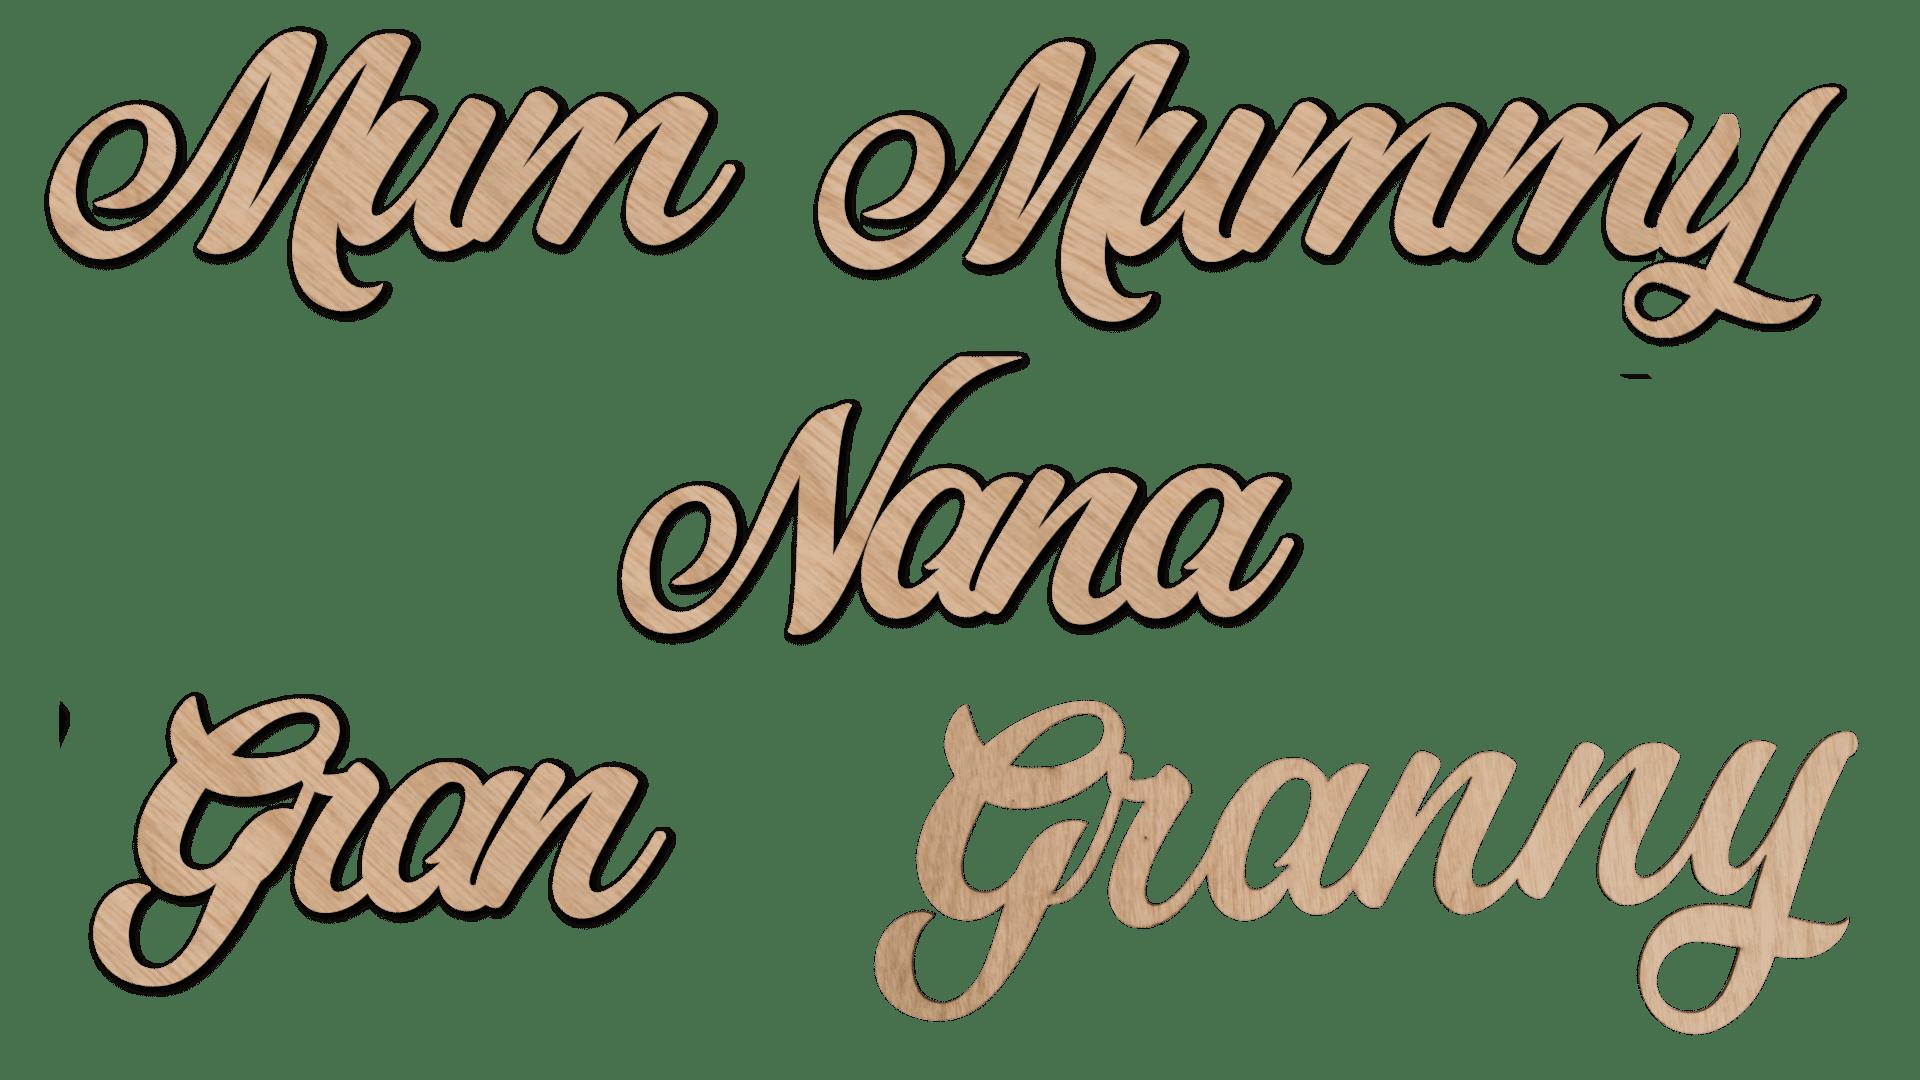 Mum, mummy, nana, gran and granny